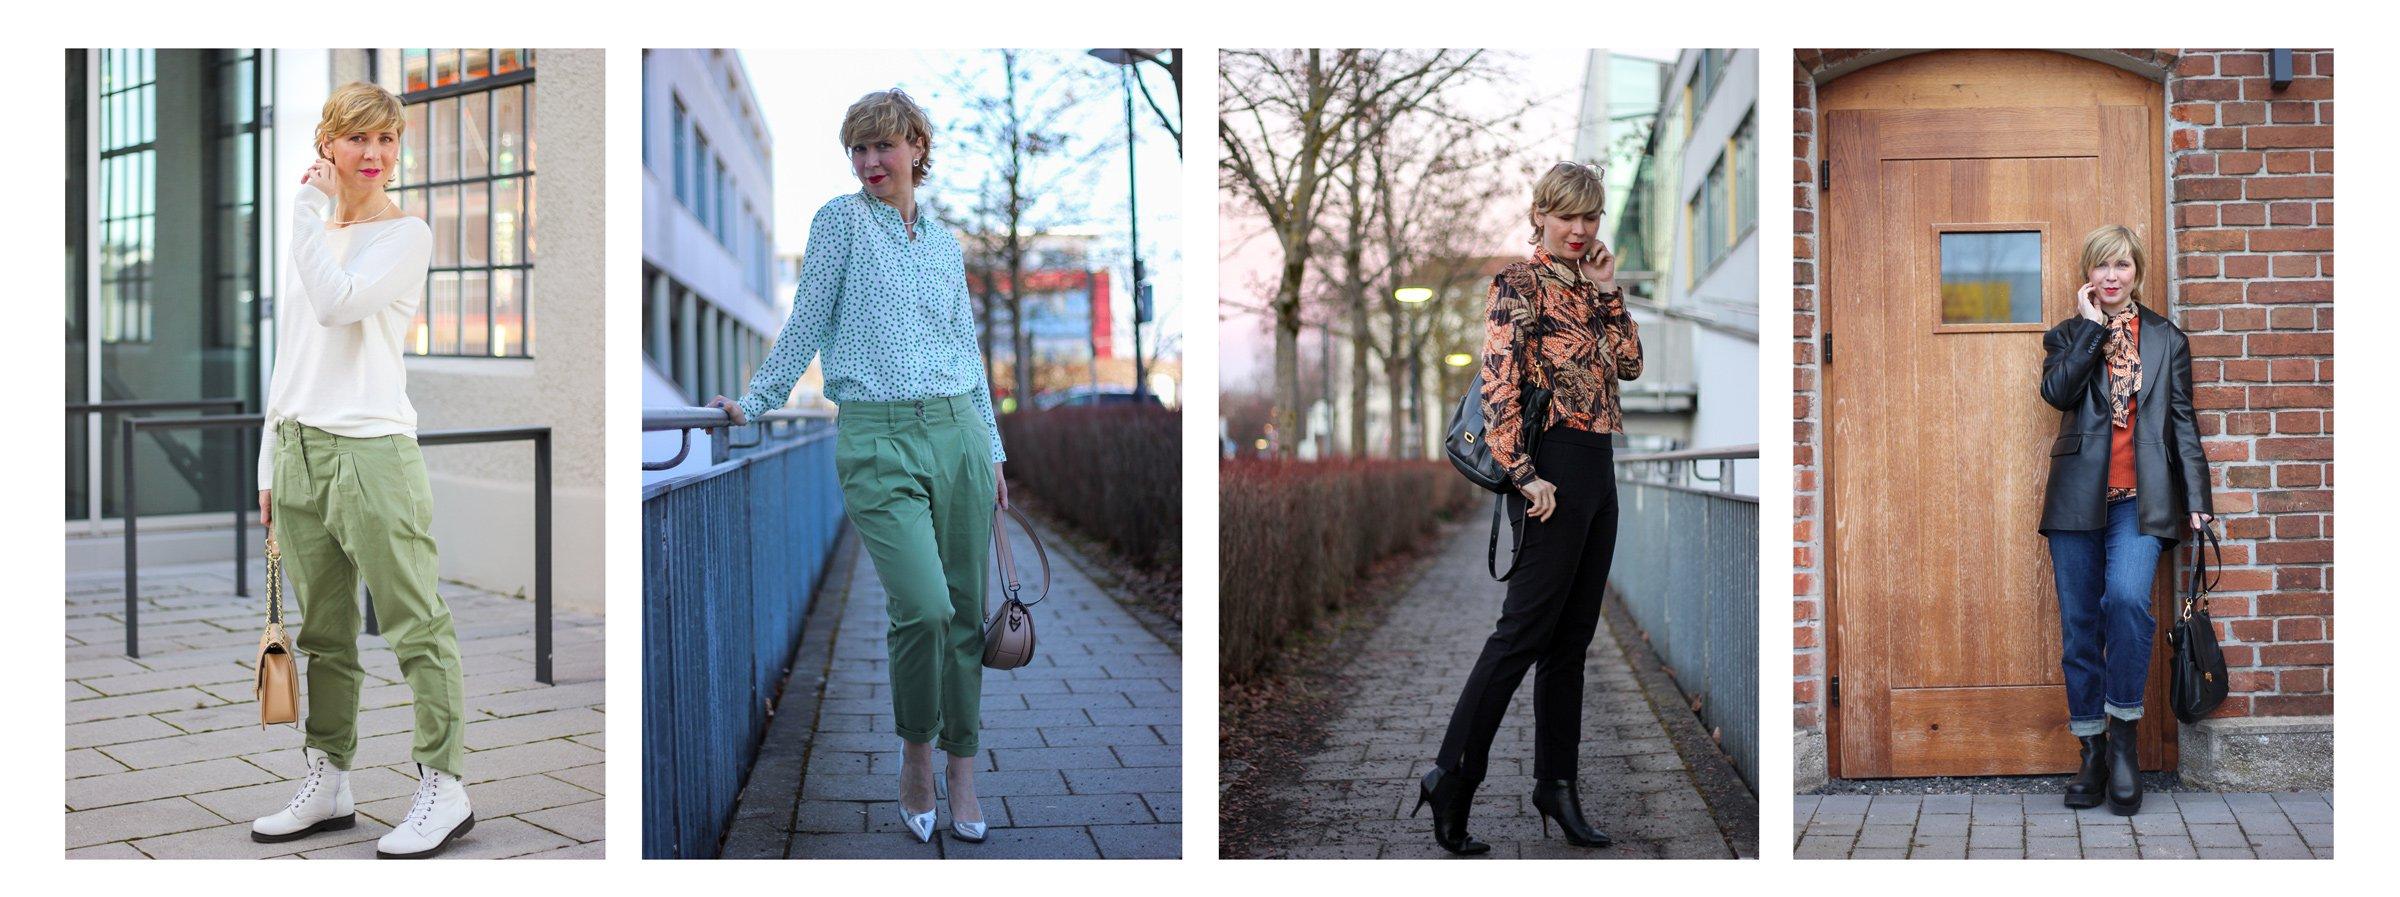 conny doll lifestyle: Frühjahrsmode von TONI-Fashion, verschiedene Outfits